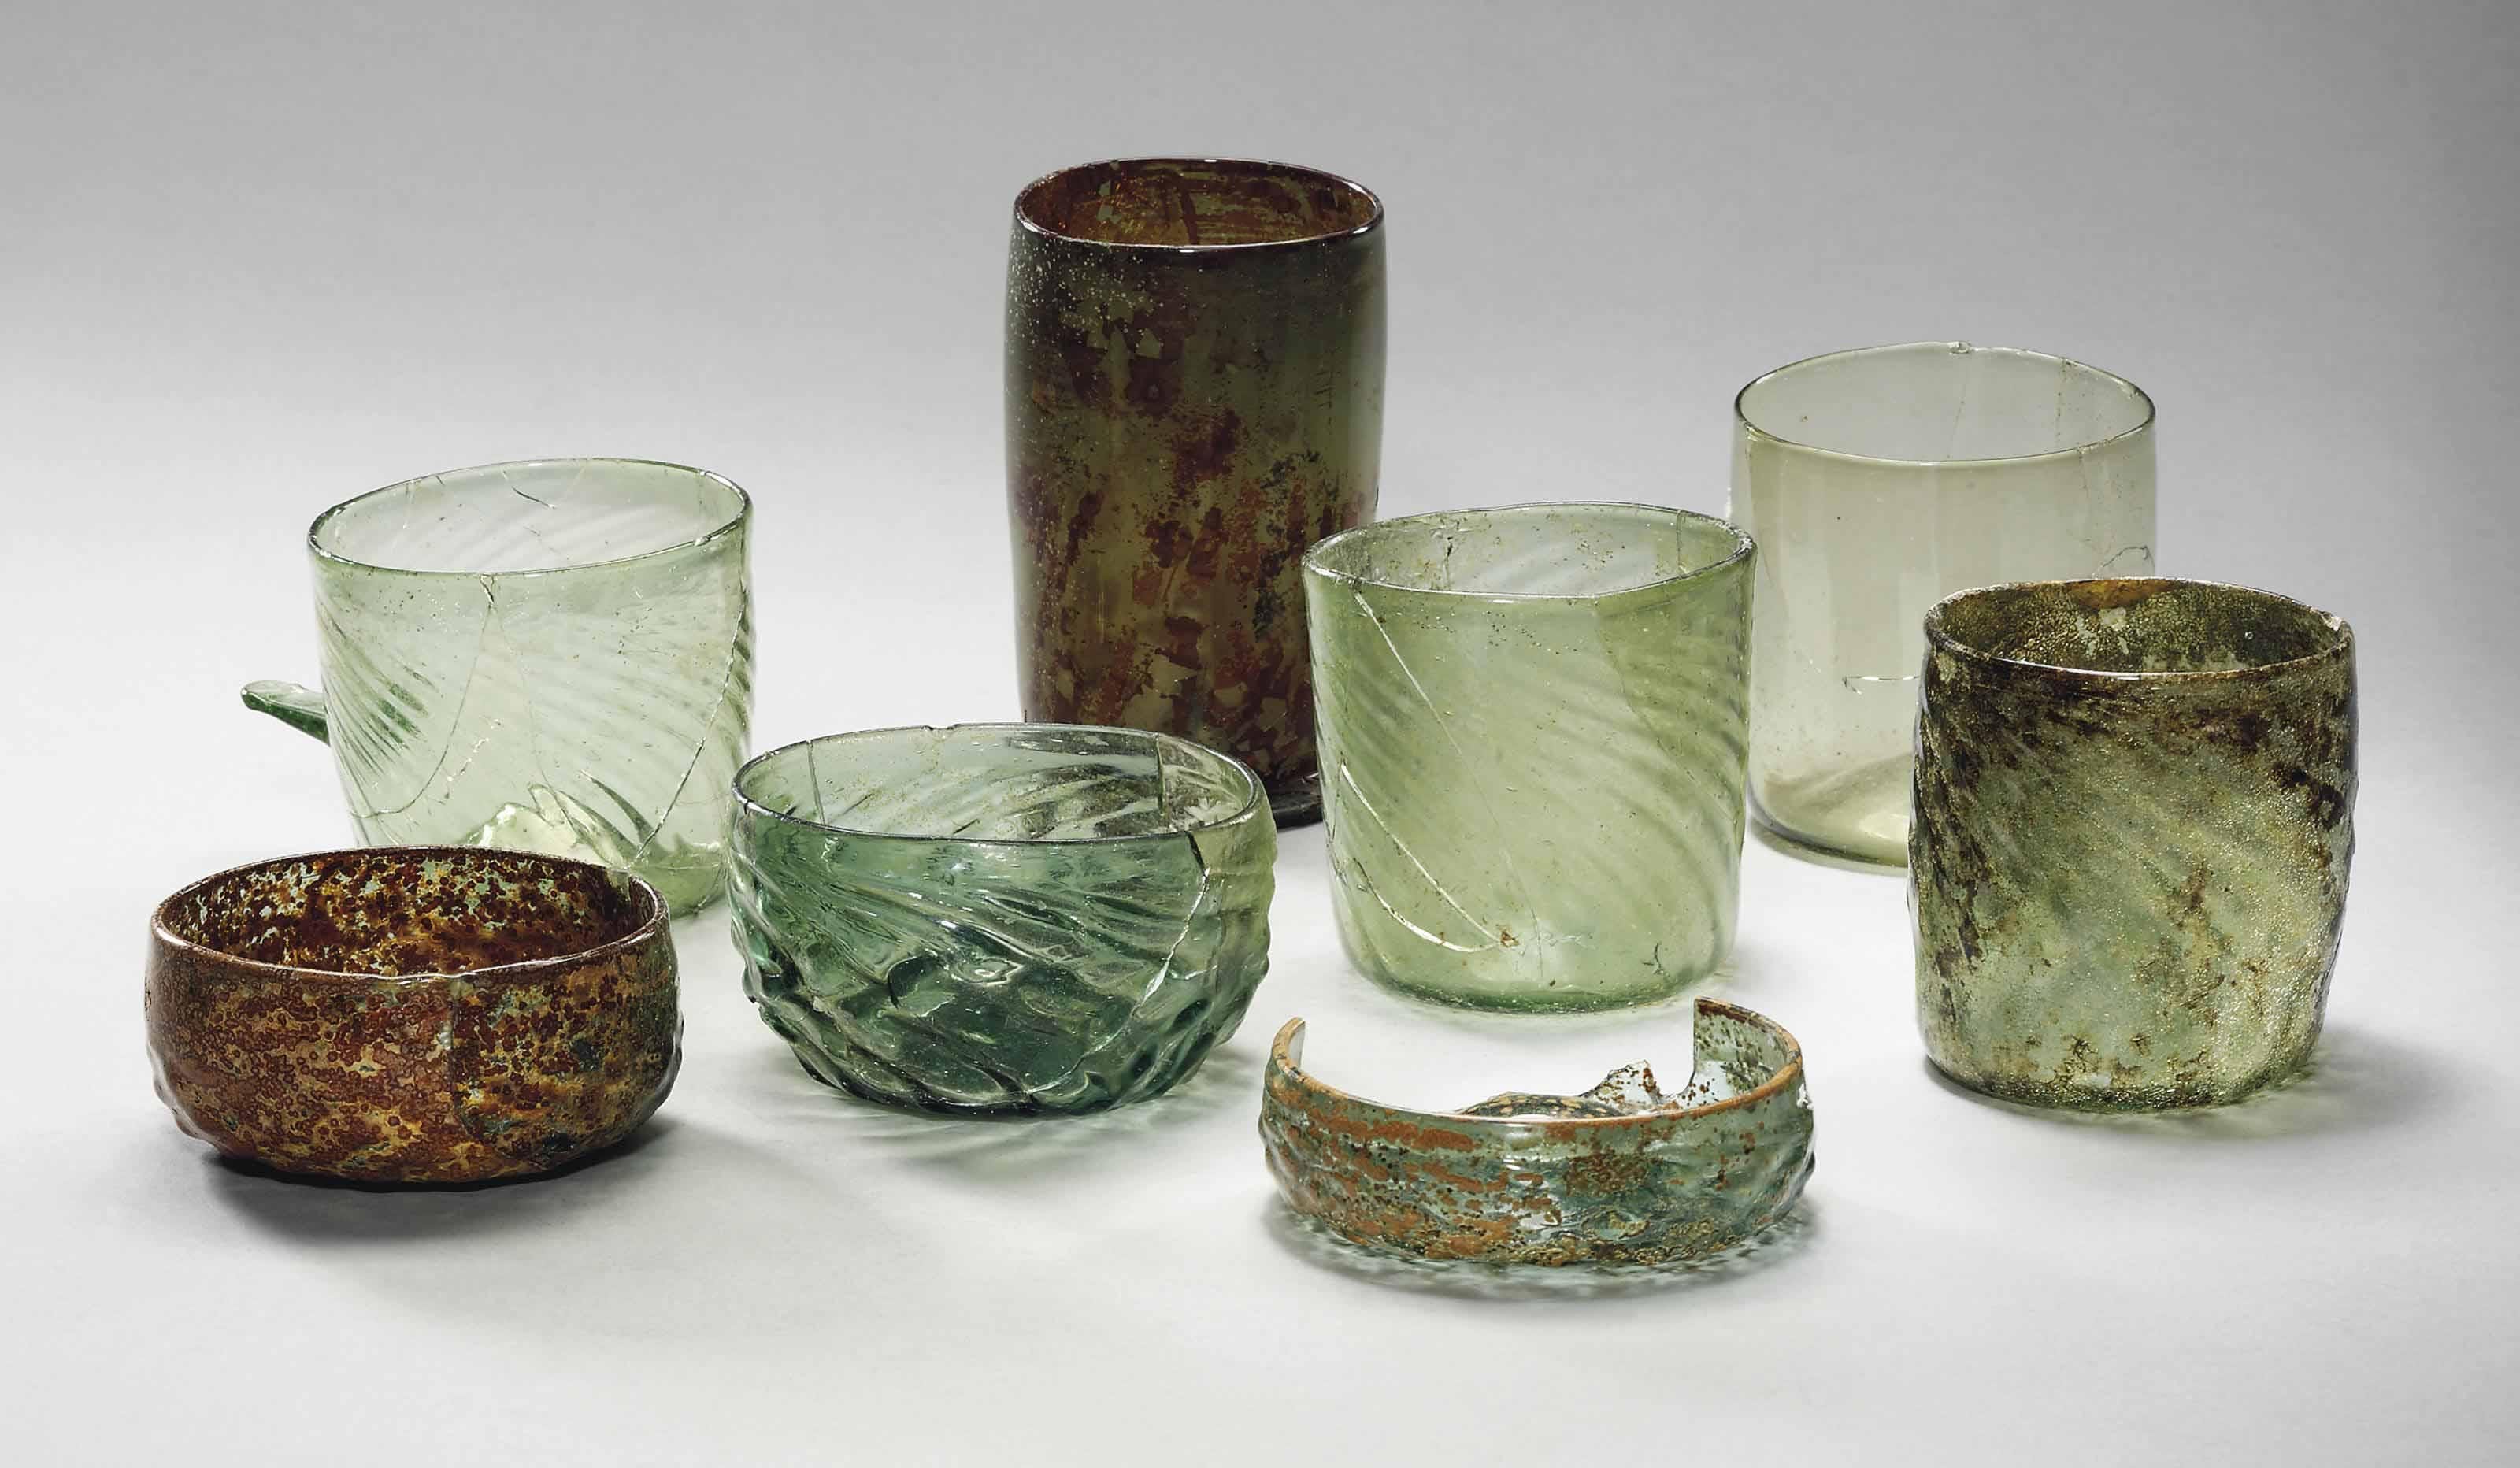 A WALDGLAS SCHEUER AND SEVEN GLASS BEAKERS